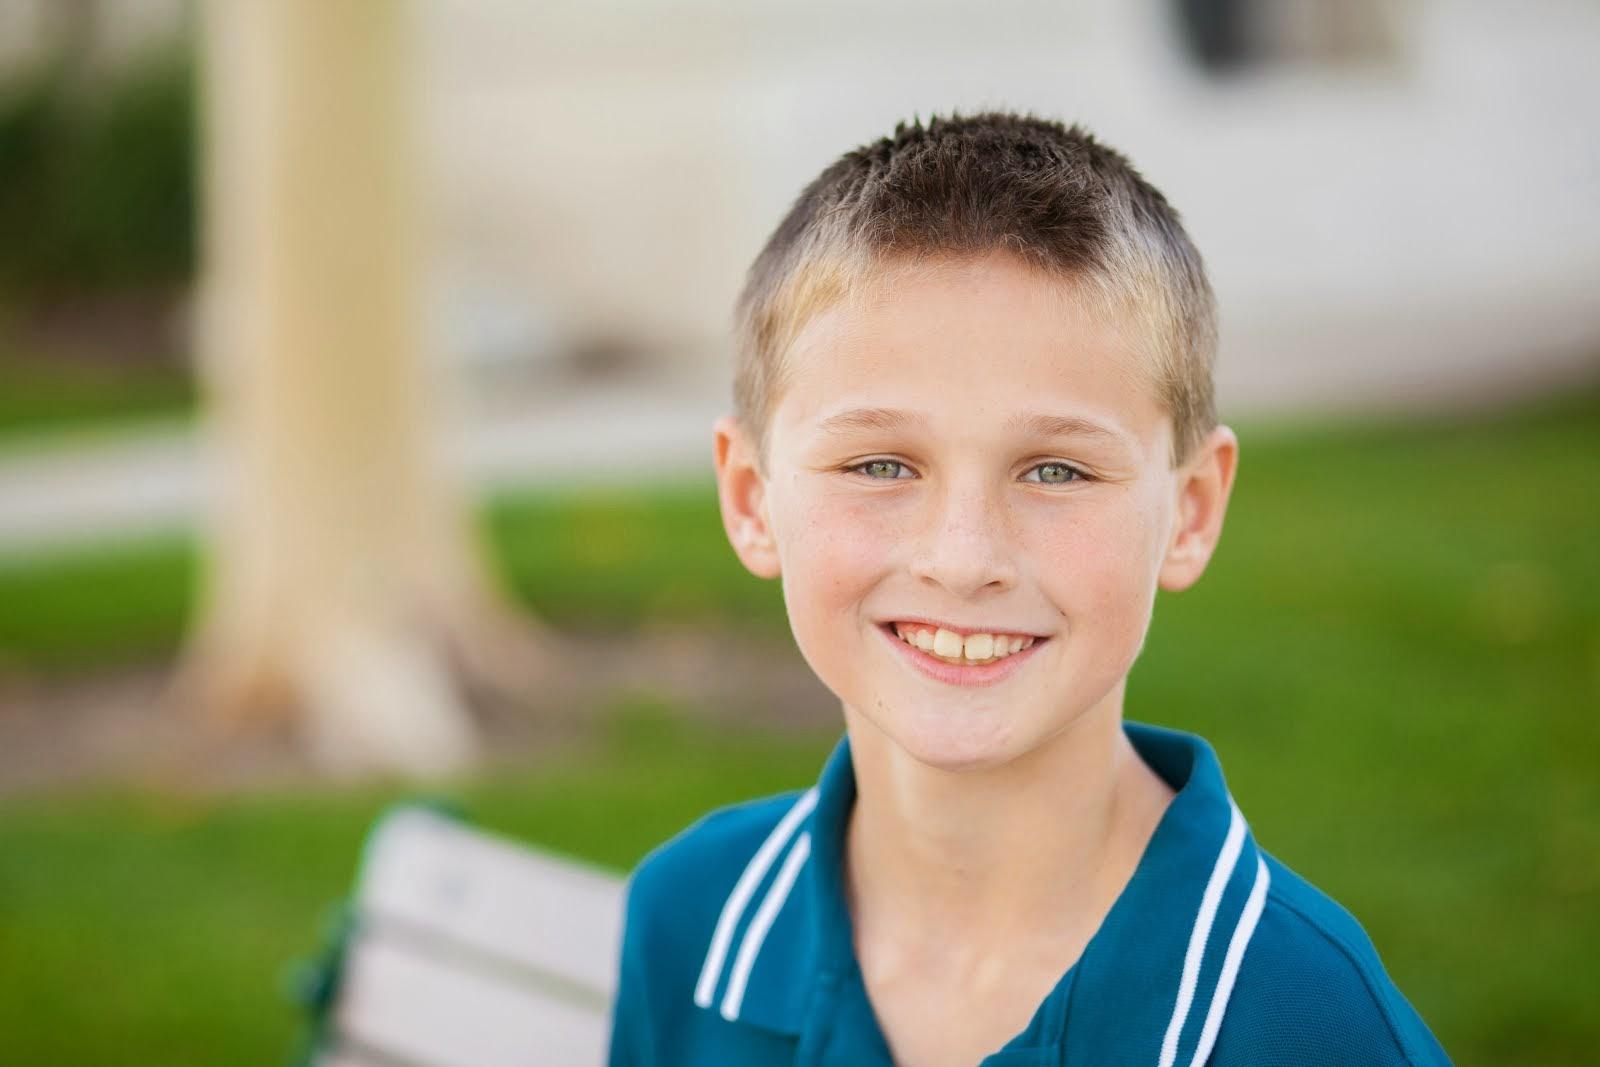 Ethan - 9 years